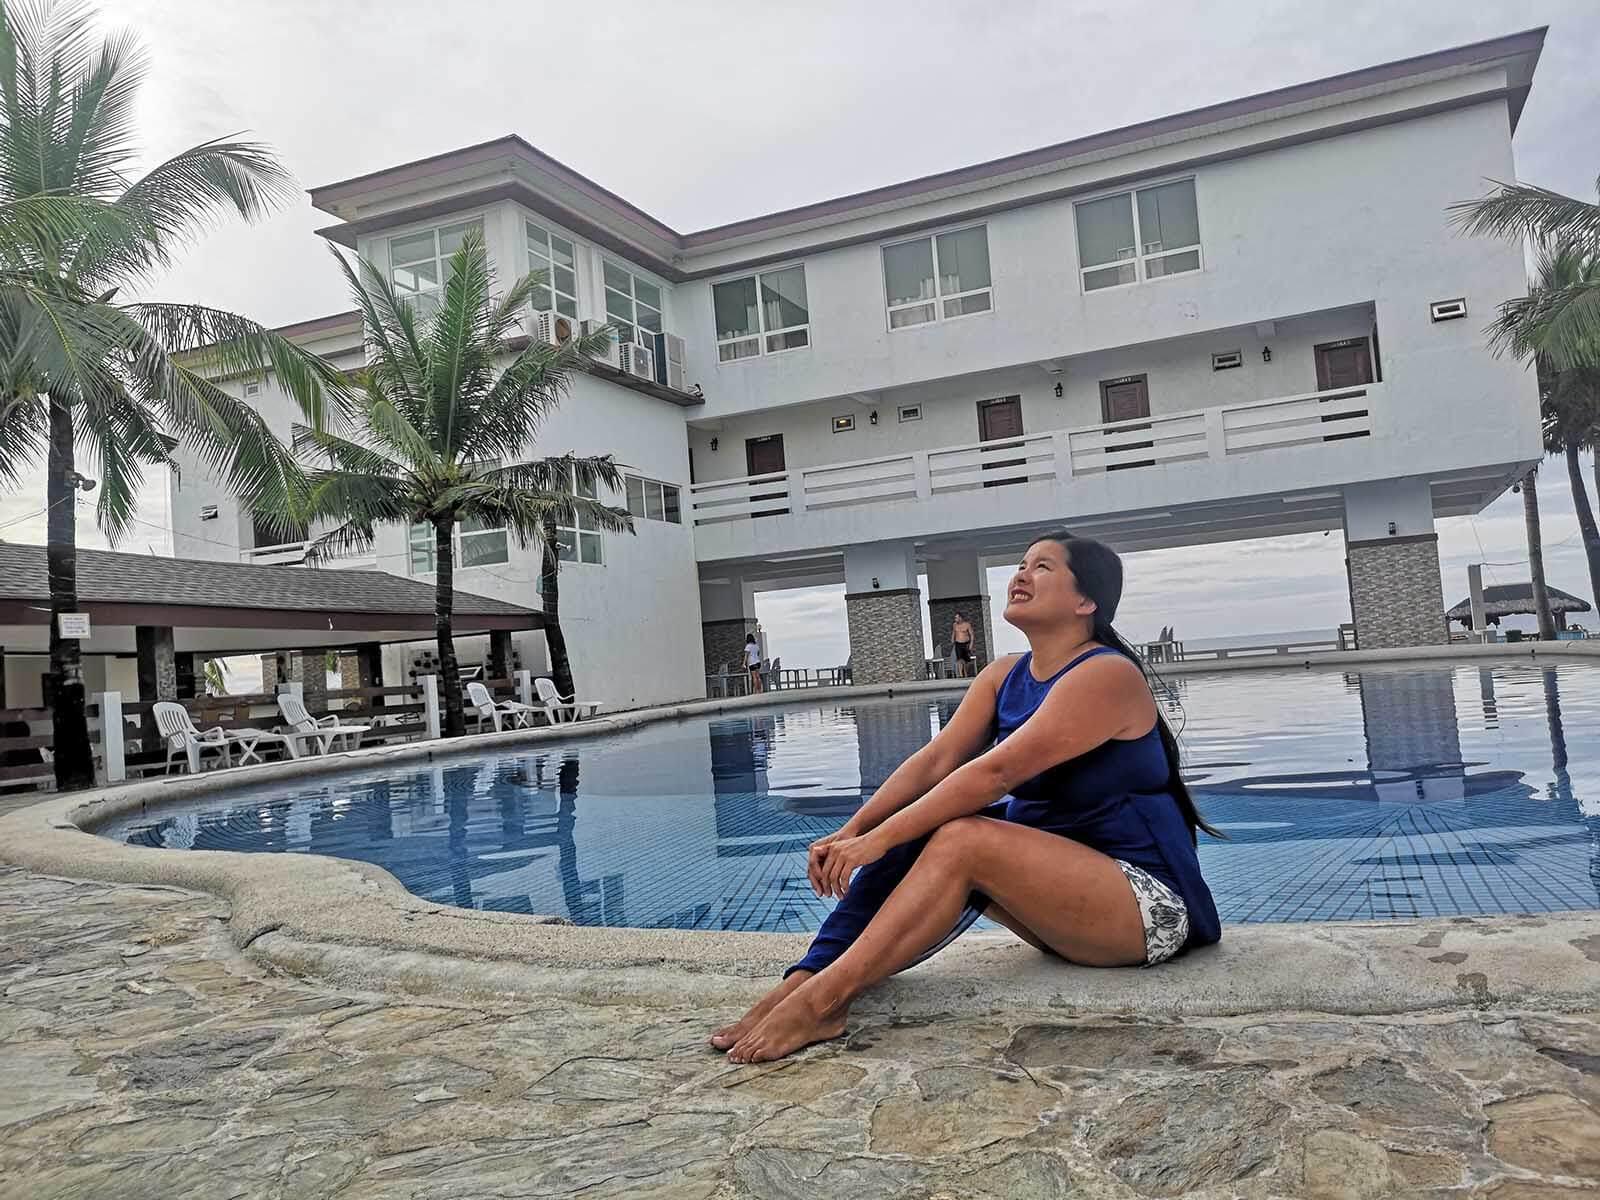 Morong Bataan Travel Guide - White Corals Beach Resort Pool